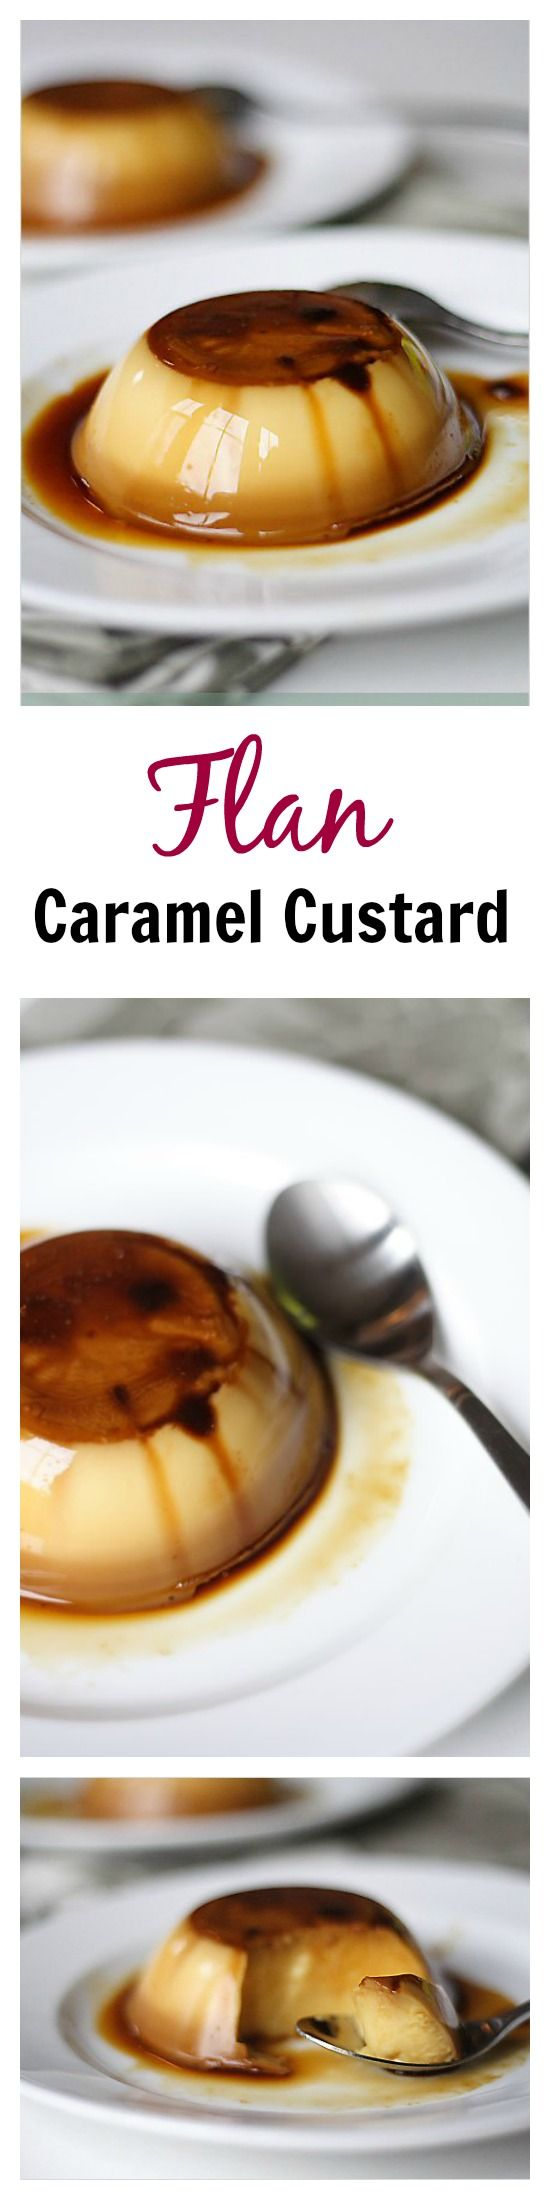 Flan or caramel custard recipe. Easy, sweet, silky smooth egg custard with caramel sauce. SO YUMMY | rasamalaysia.com